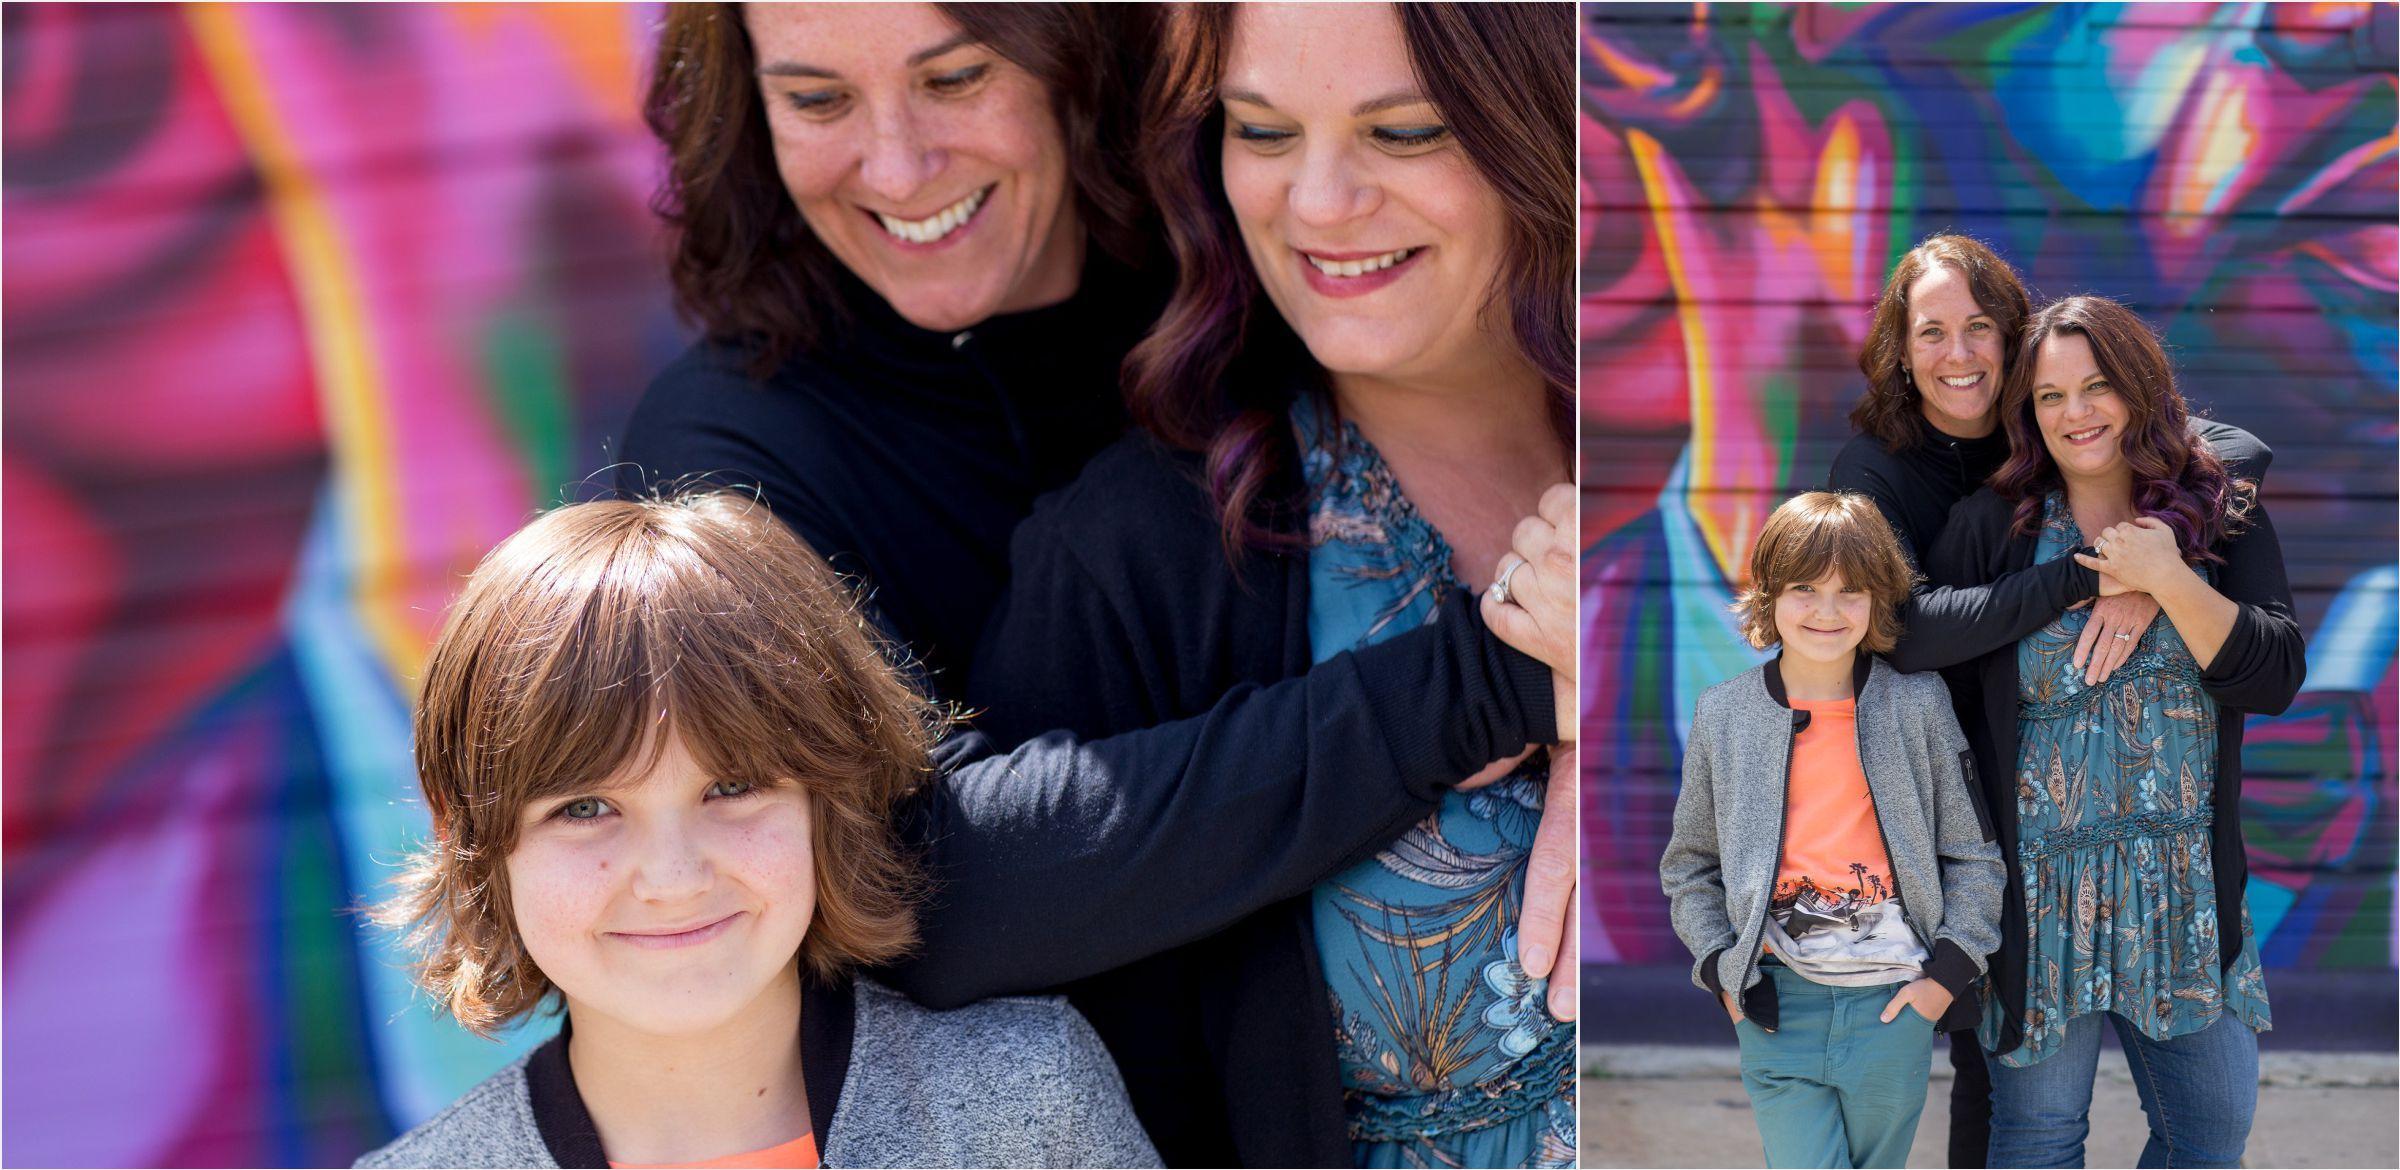 a-colorful-family-portrait-session-in-denver-rino-arts-district-003